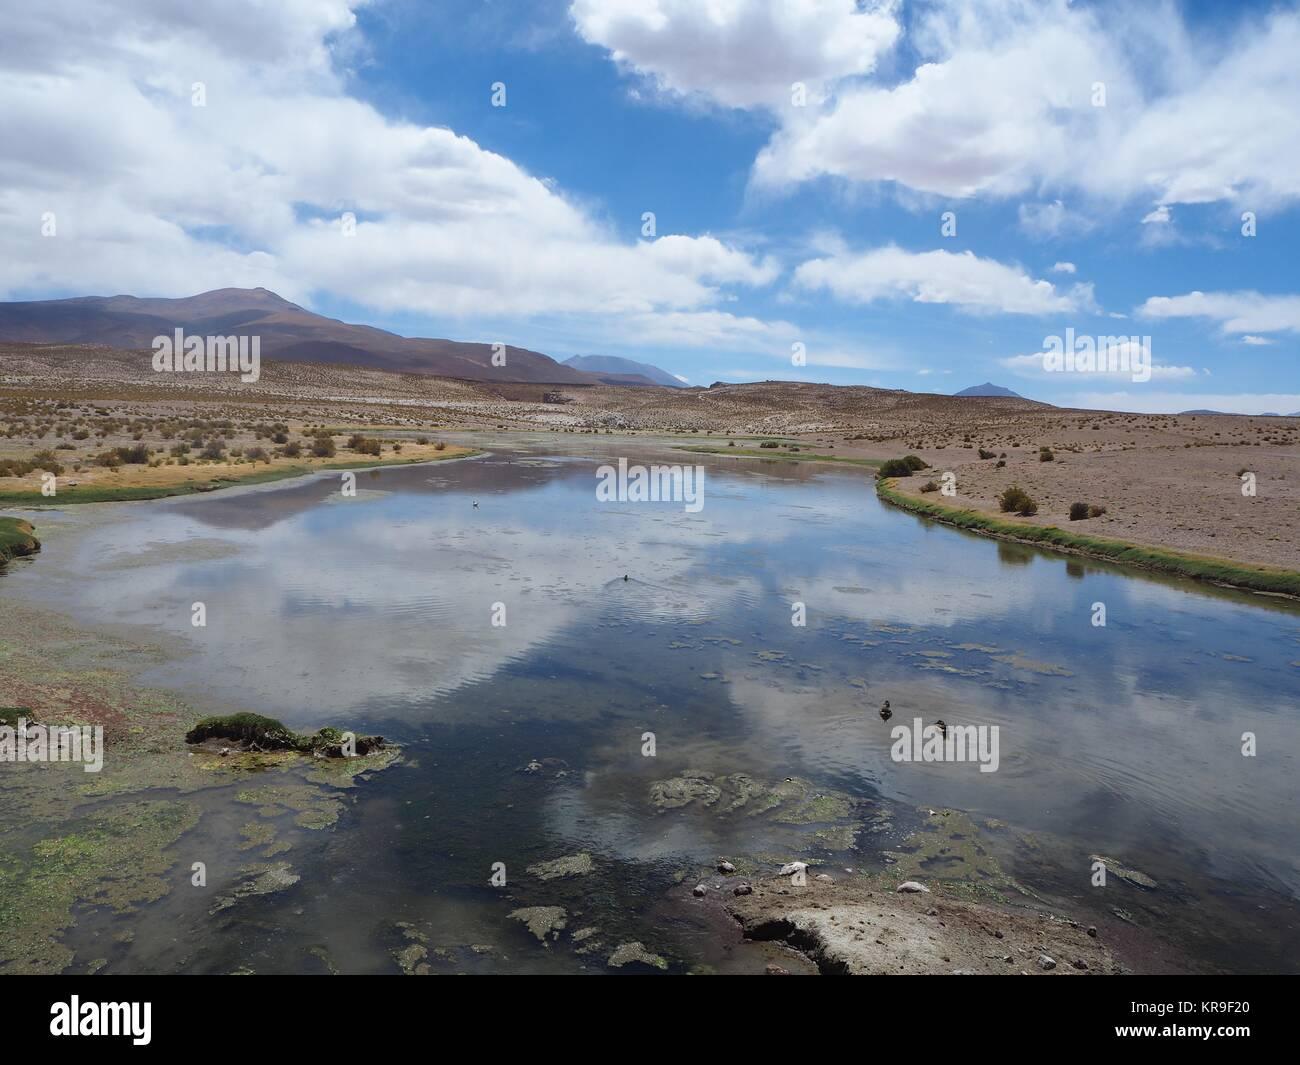 landscape shot - Stock Image